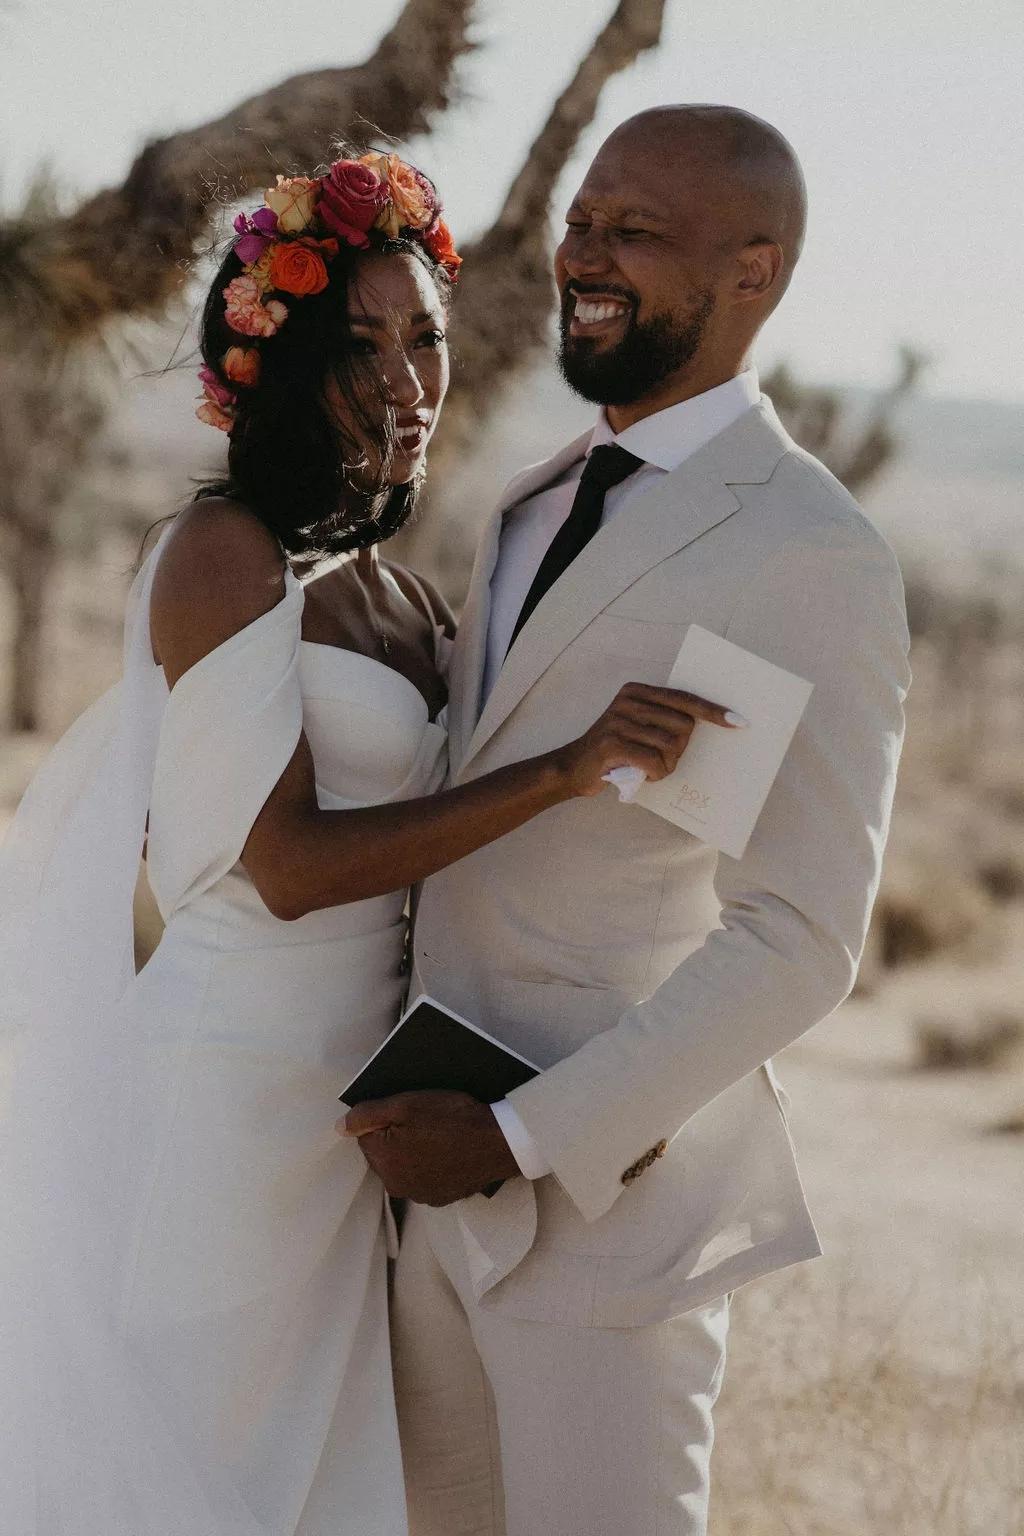 Y0cPq6Dts0U - Найти свадебного ведущего оказалось проще простого